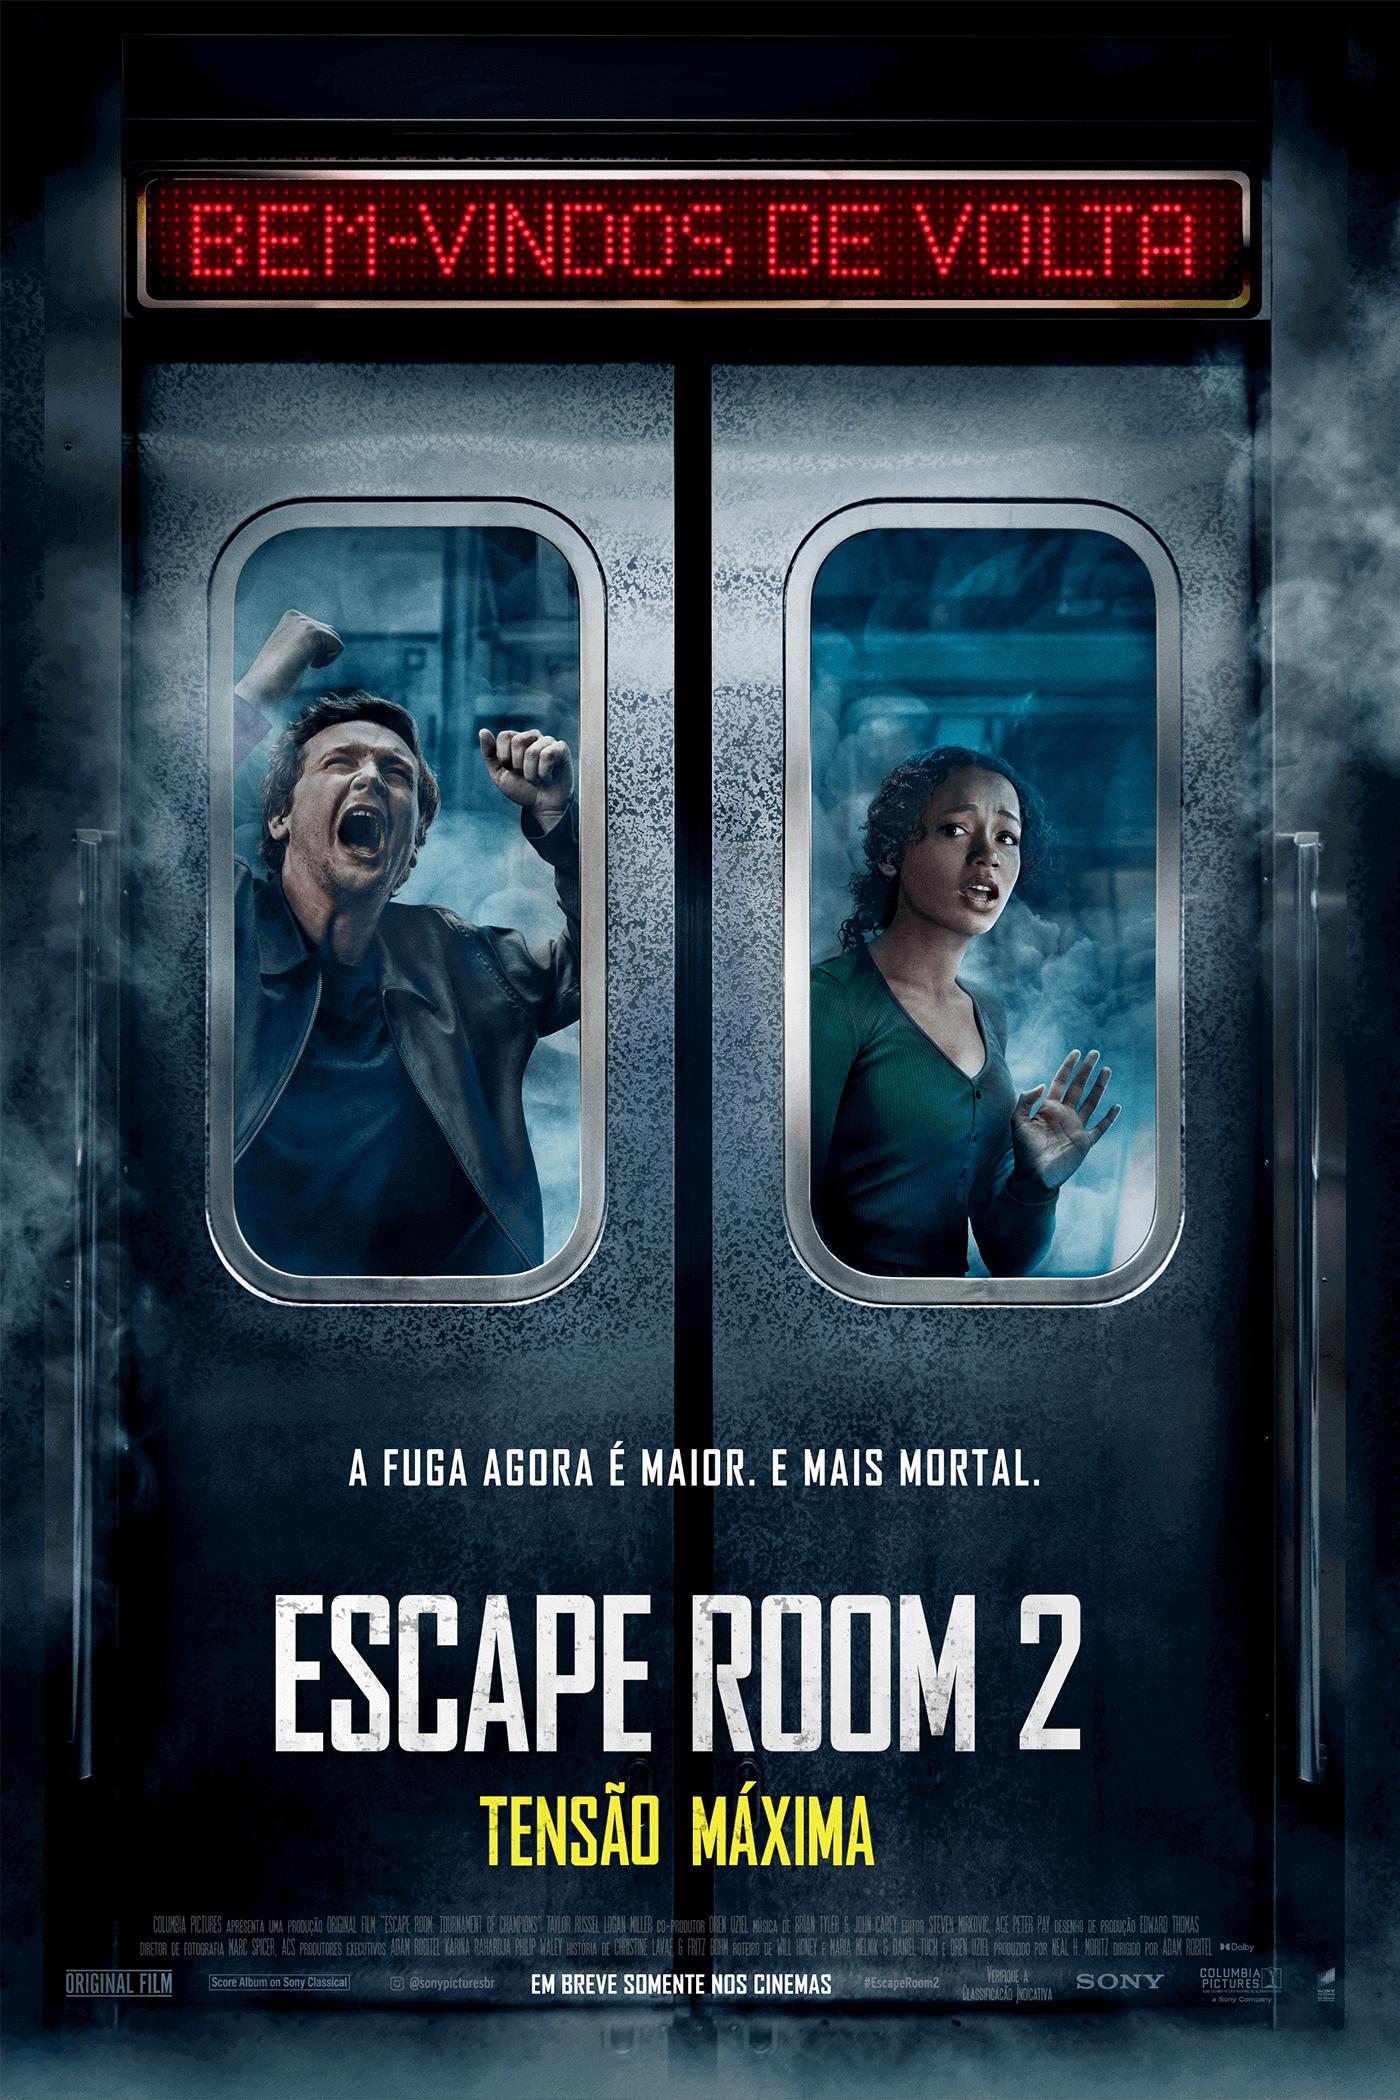 Escape Room 2: Tensão Máxima | Sony Pictures Brazil